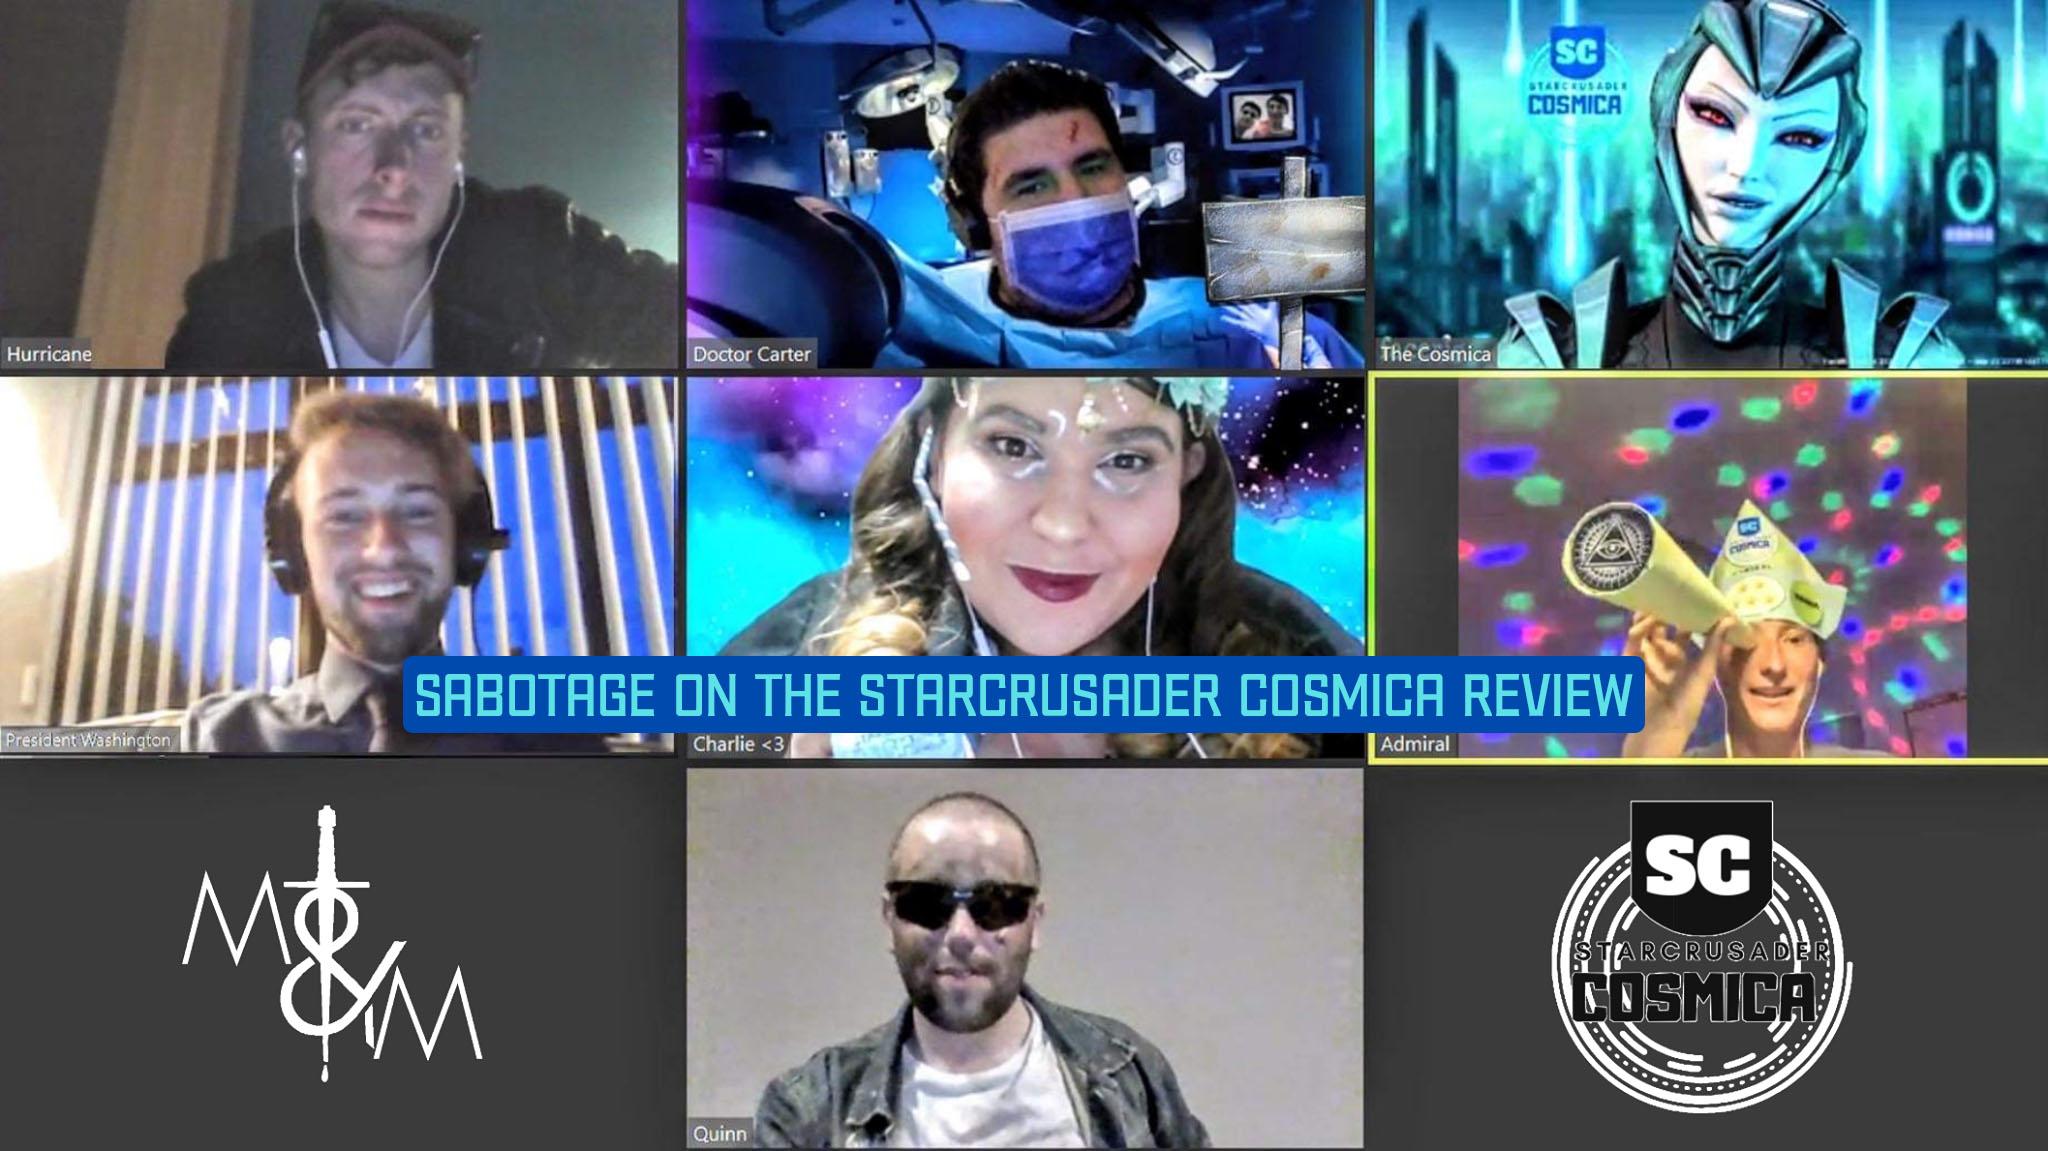 Sabotage on the Starcrusader Cosmica